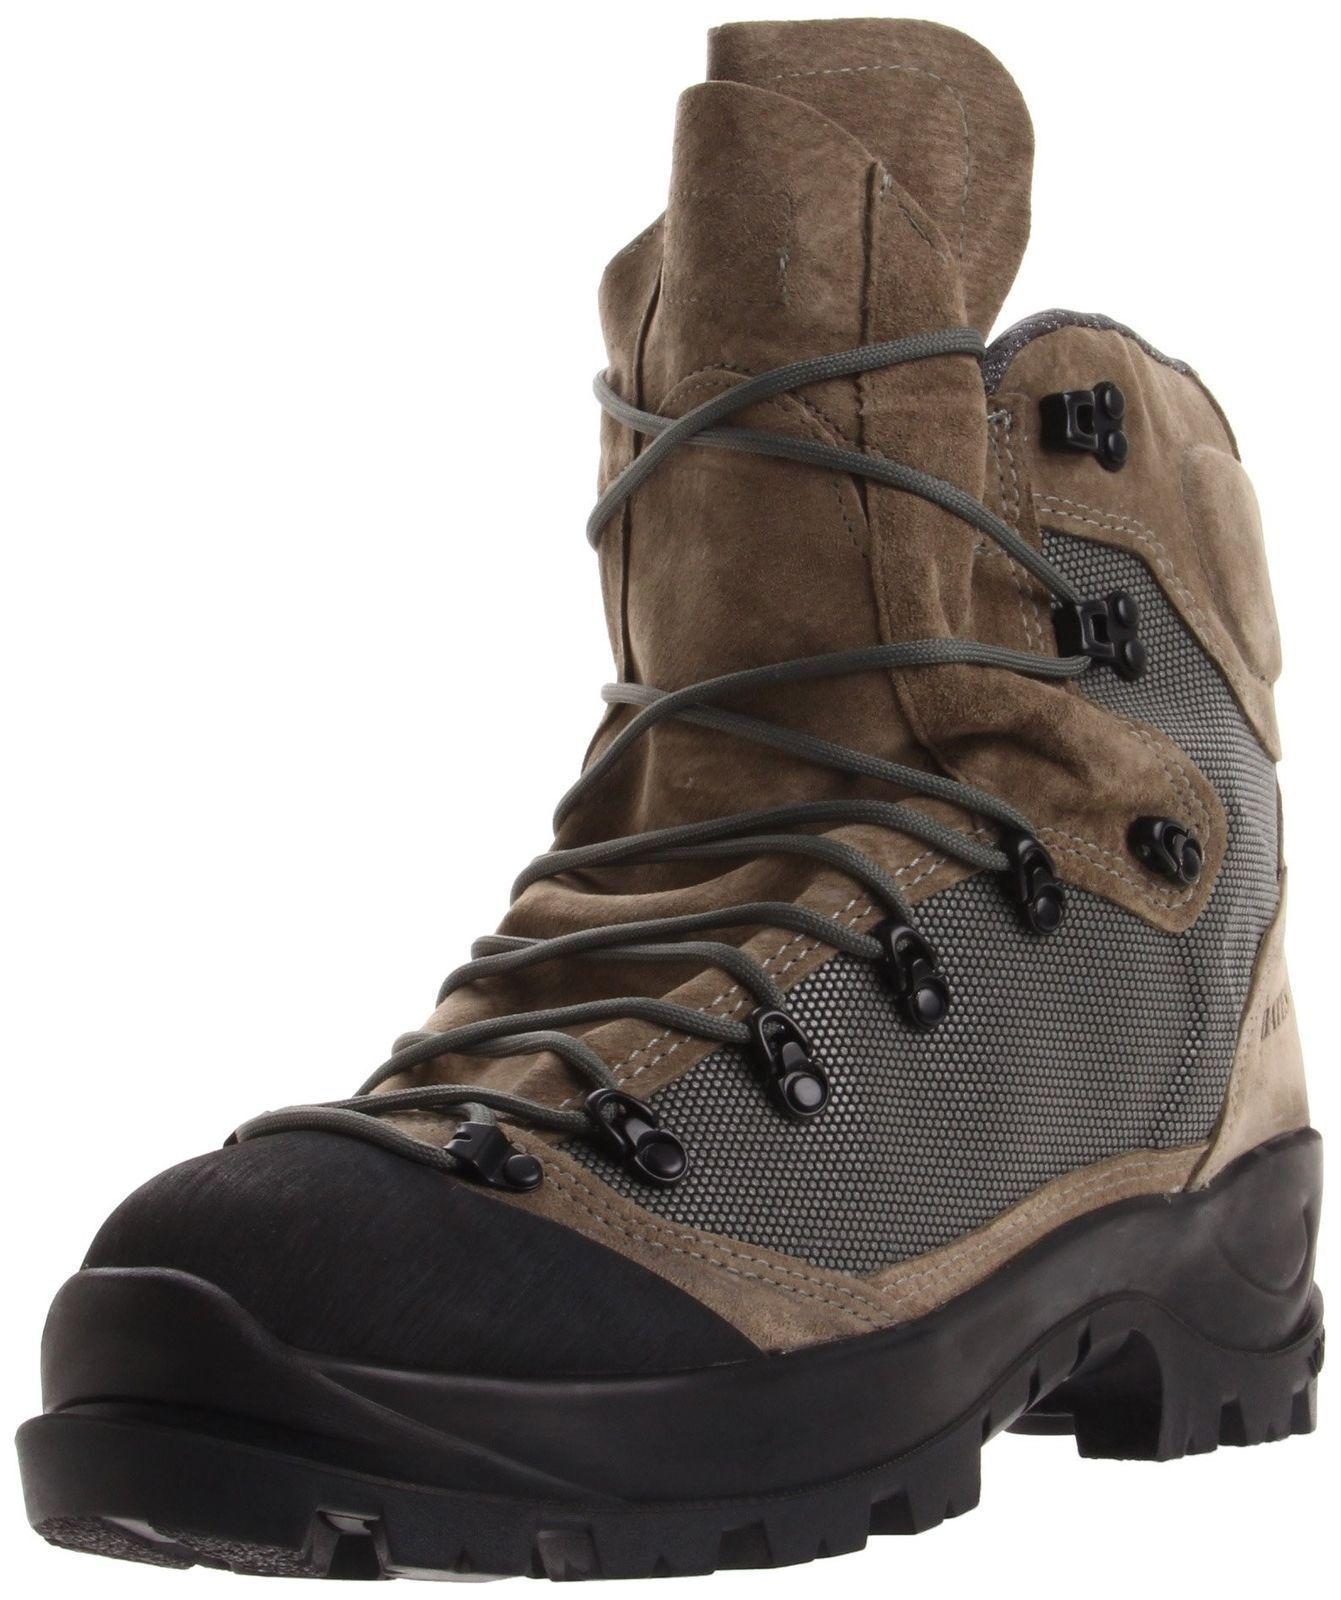 Bates Tora Bora Alpine Military Mountain Hiking Boots New Choice of Sizes